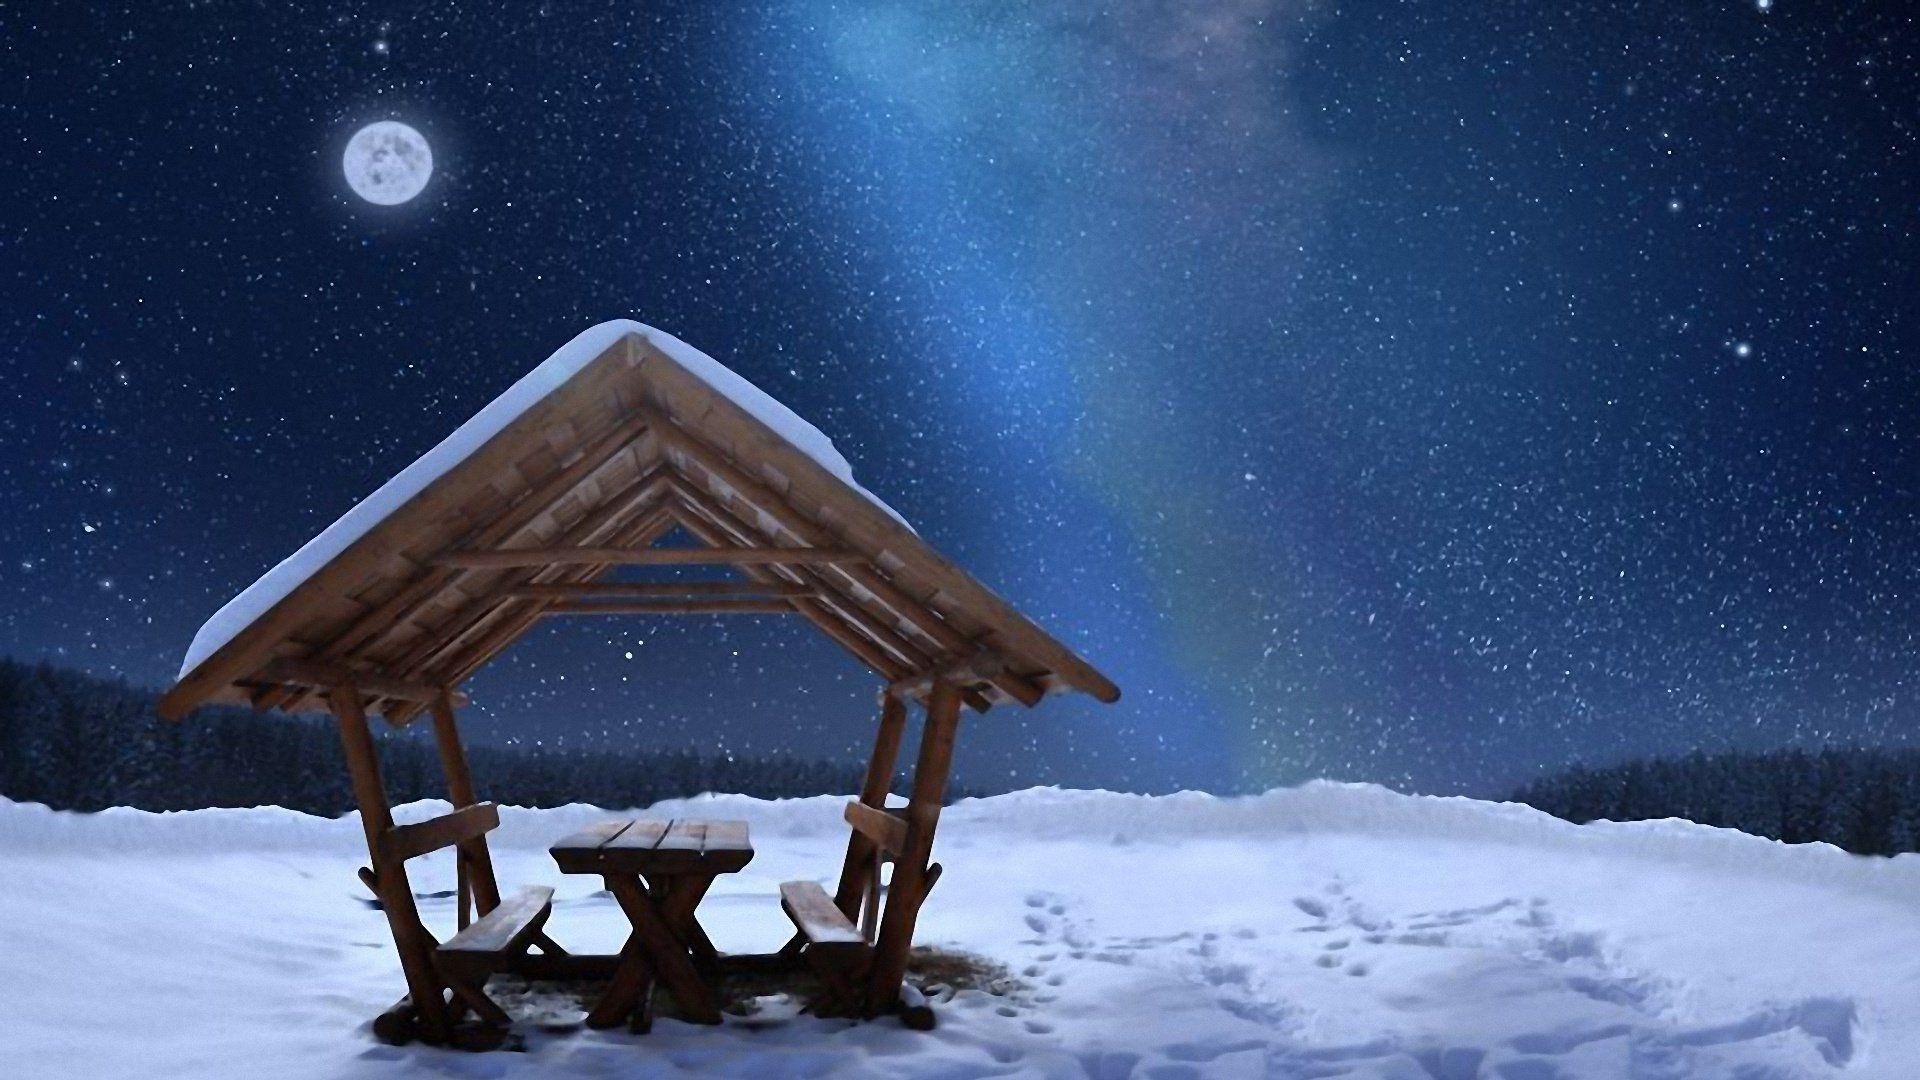 Winter Moon Wallpapera